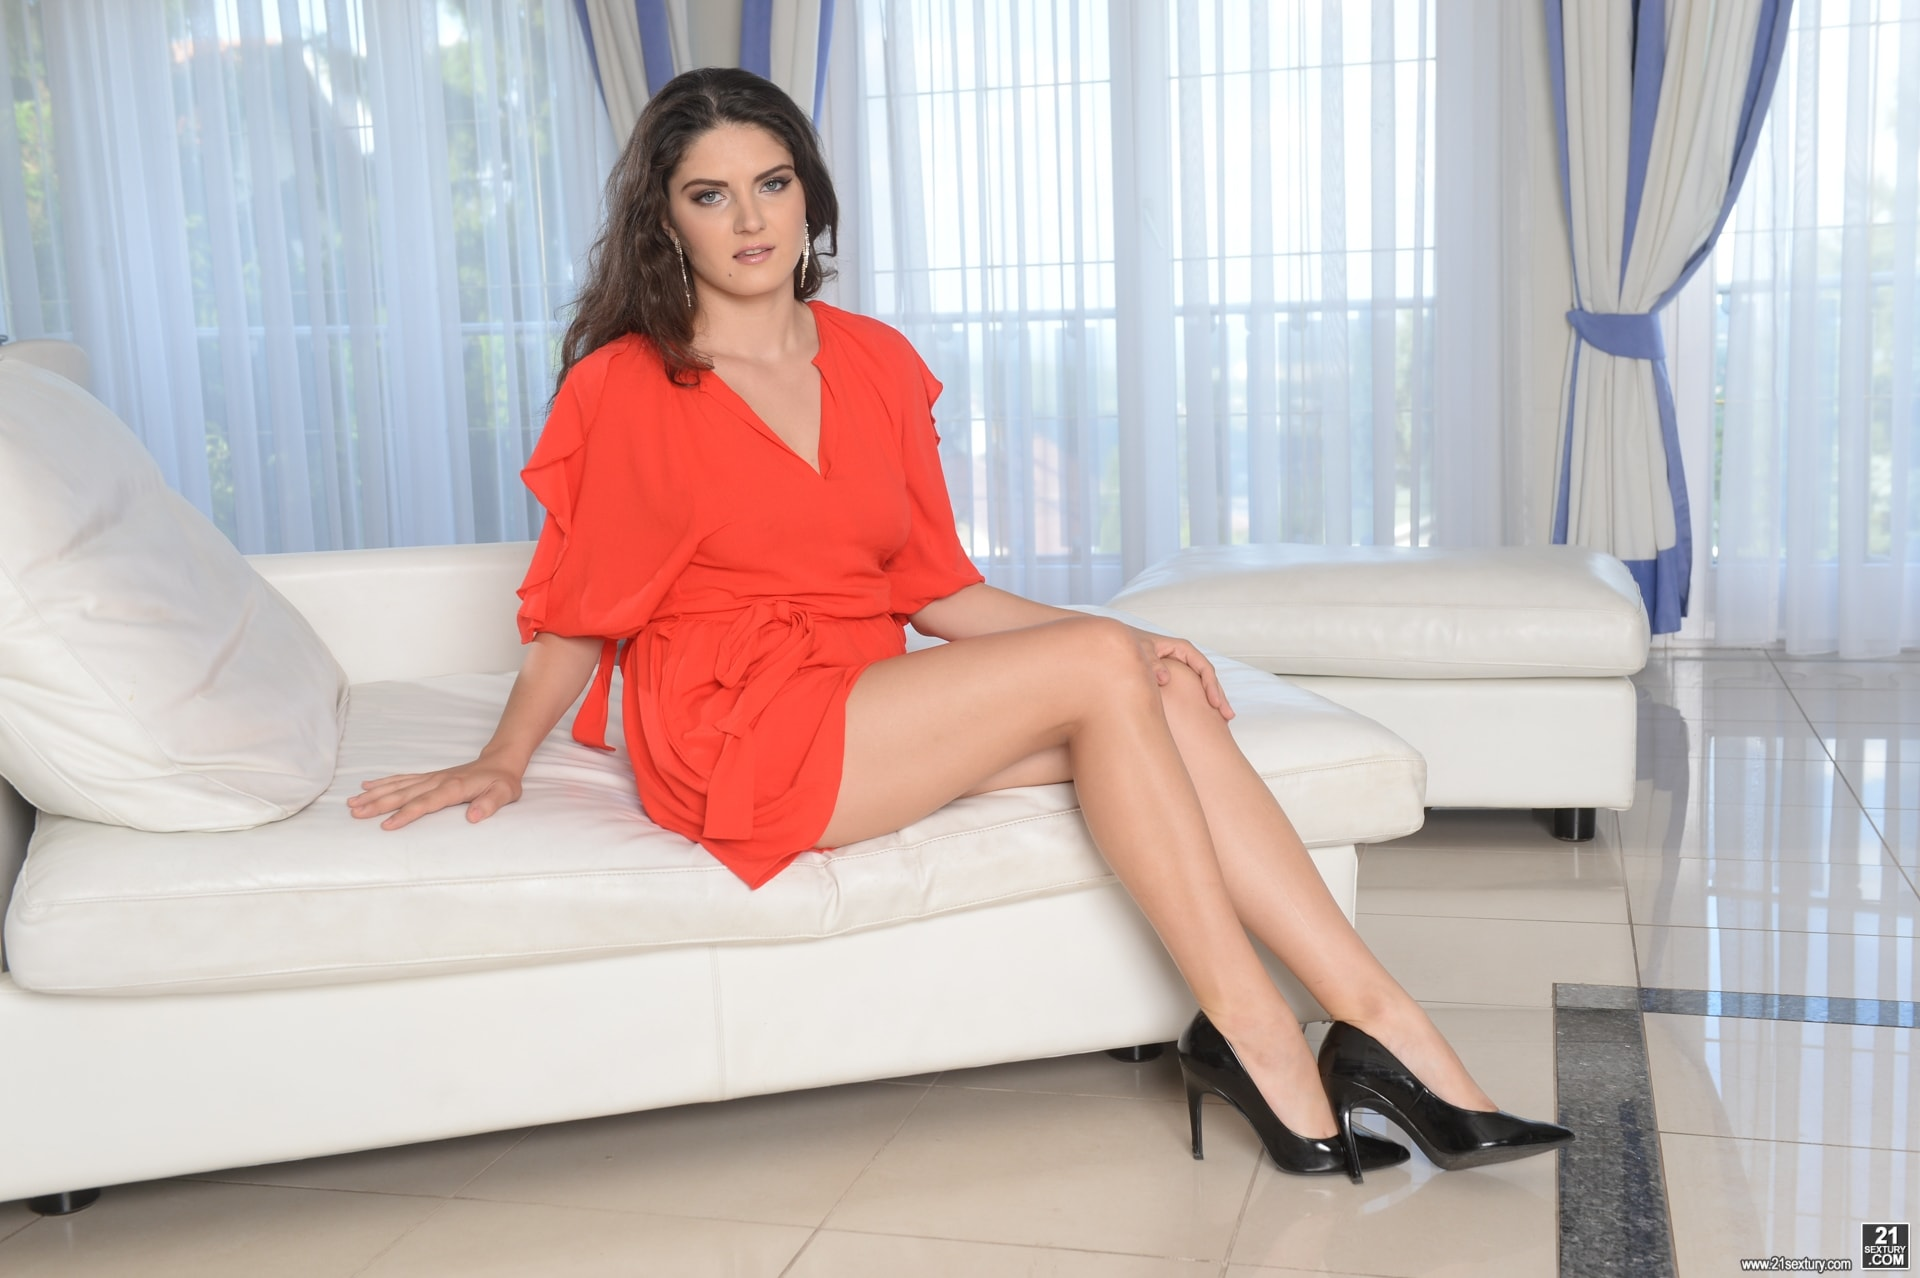 21Sextury 'Make It A Double' starring Franceska Dicaprio (Photo 1)